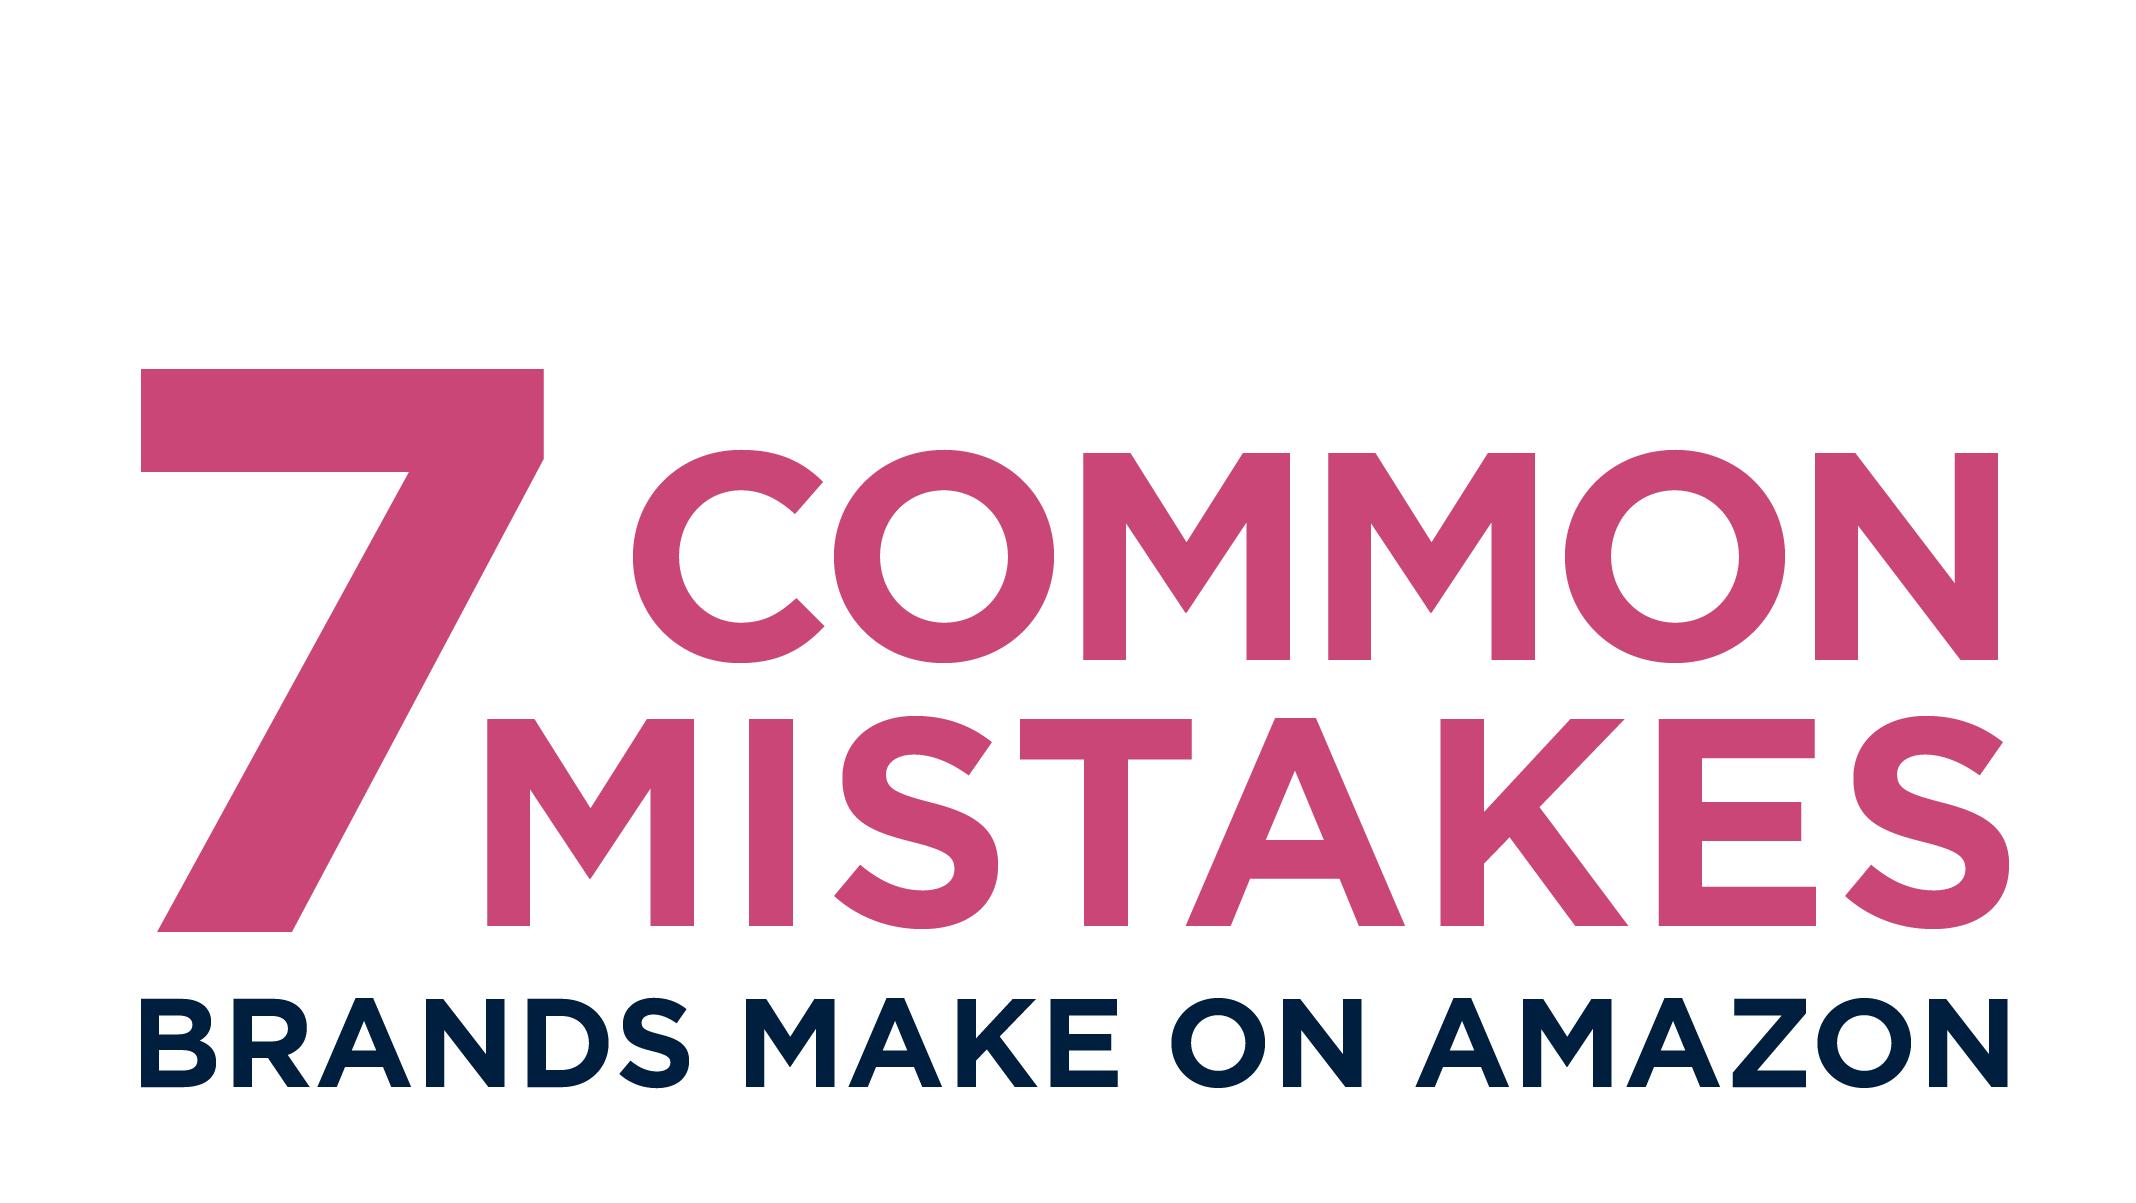 Common Mistakes Brands Make on Amazon